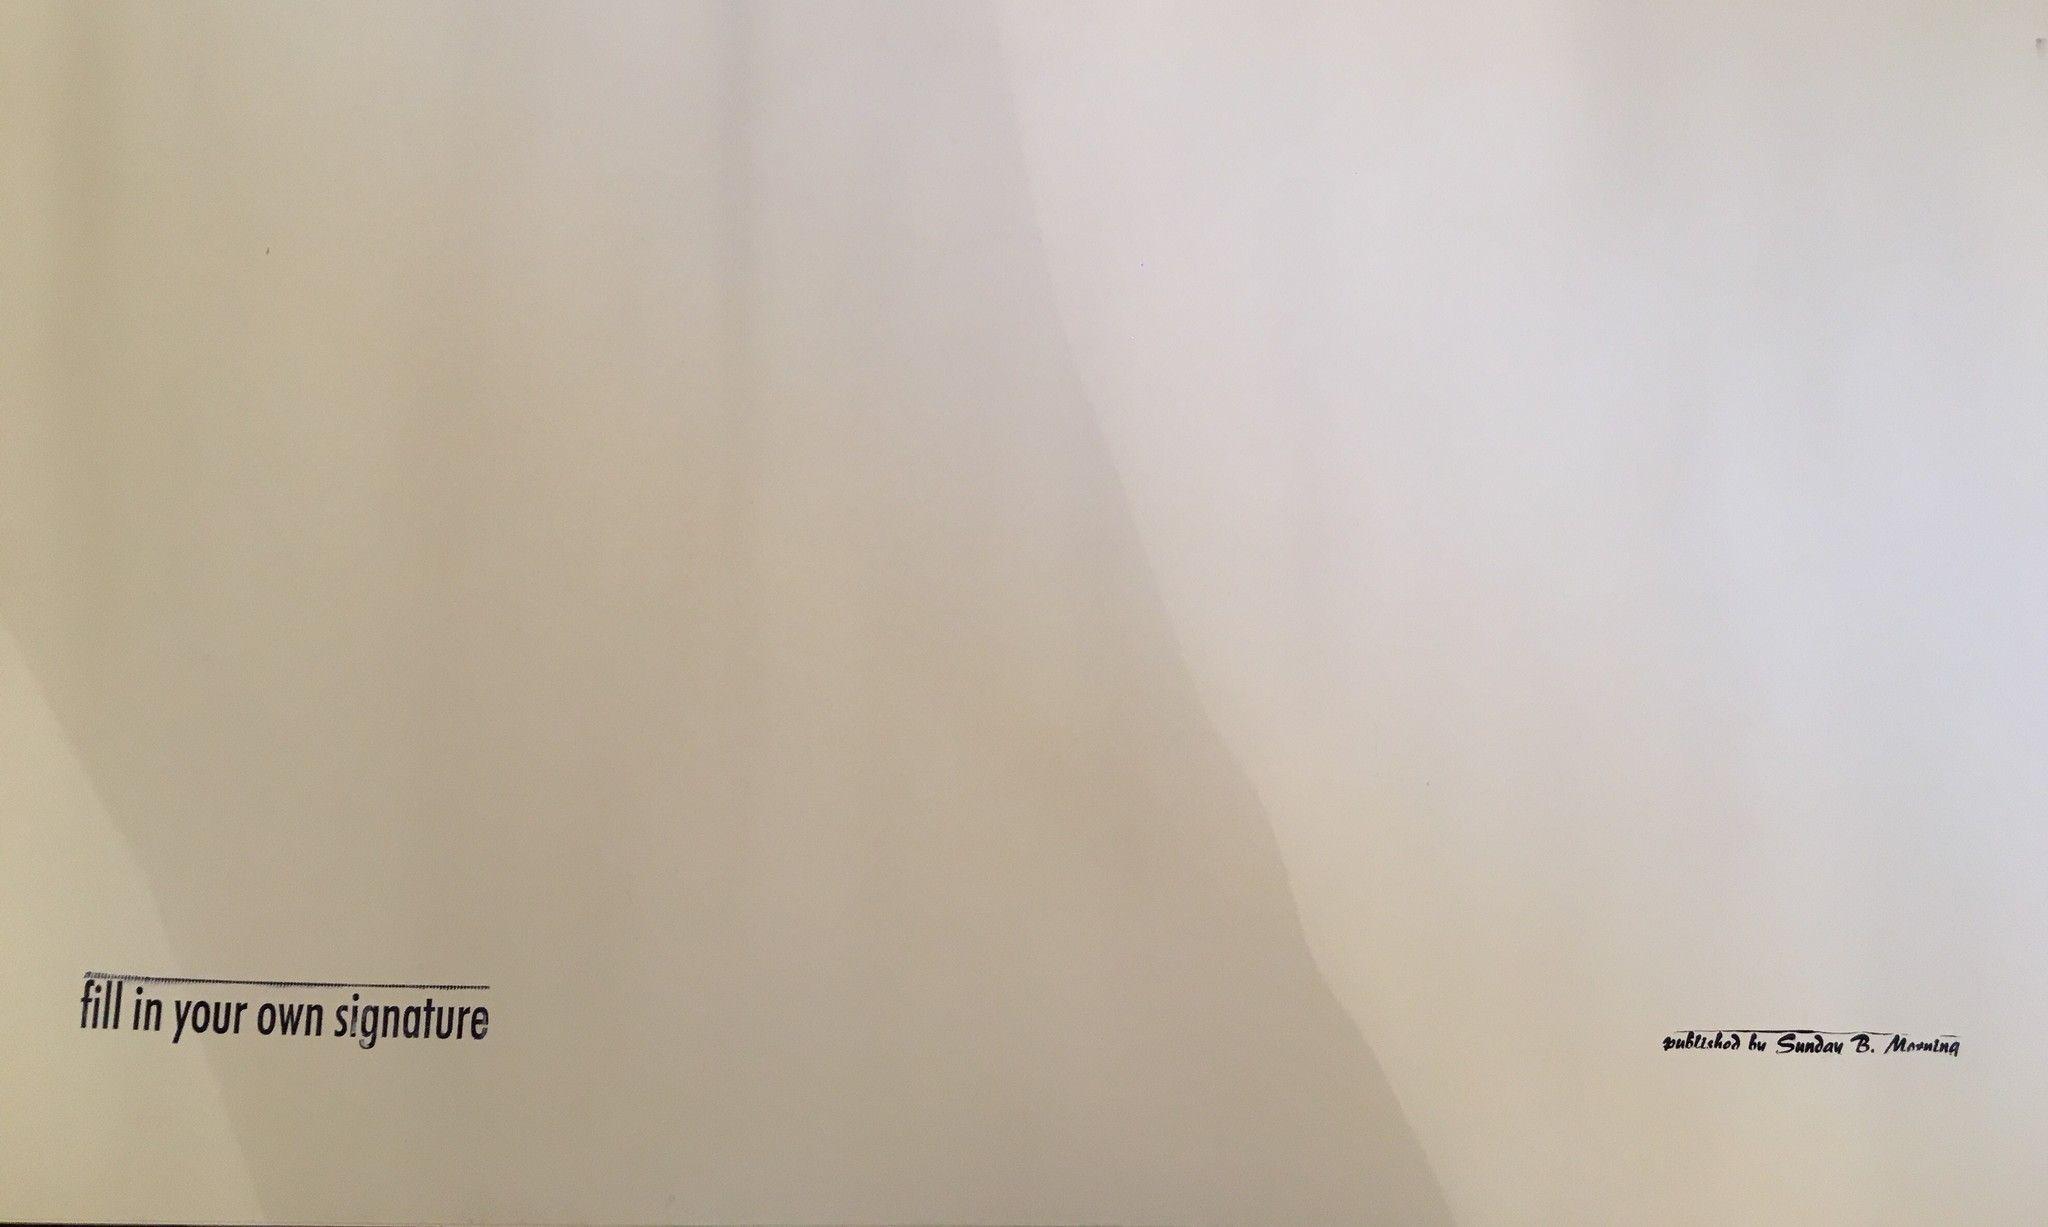 SERIGRAFIA ANDY WARHOL ' MARILYN 10 '  dimensioni L 91,5 x H 91,5 cm.